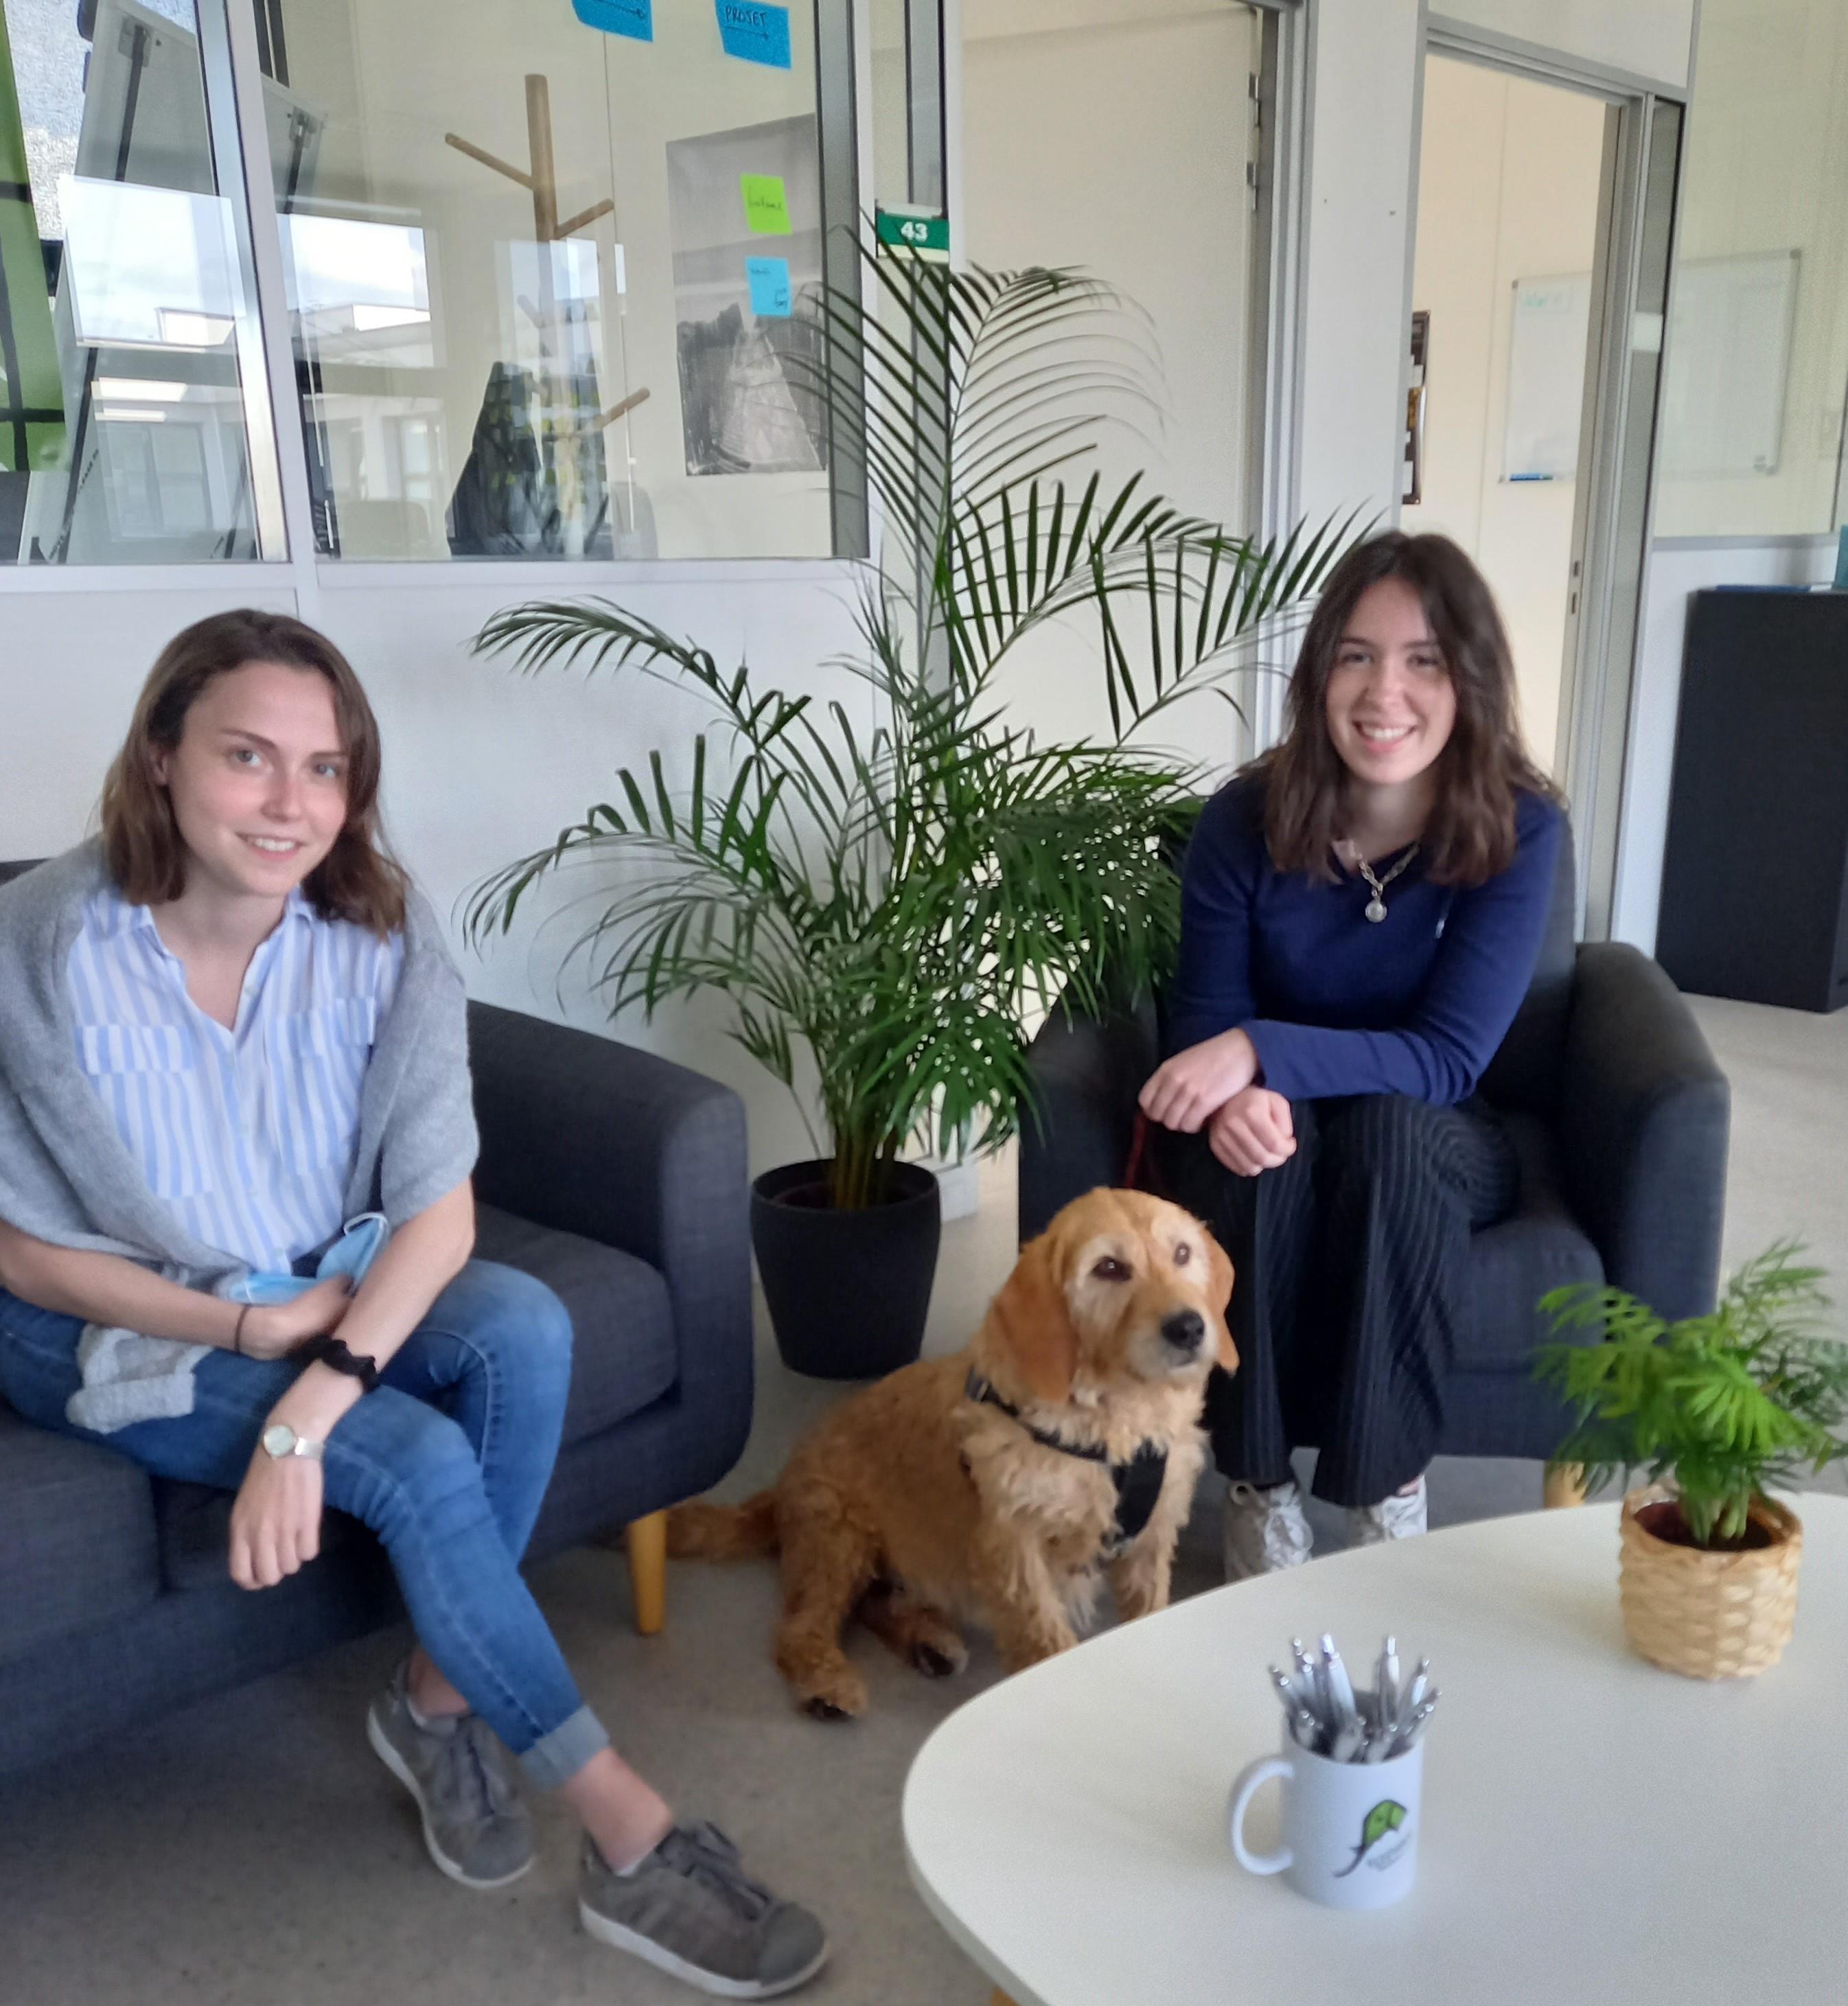 Nouvelles stagiaires en RH et marketing - Klara et Julie